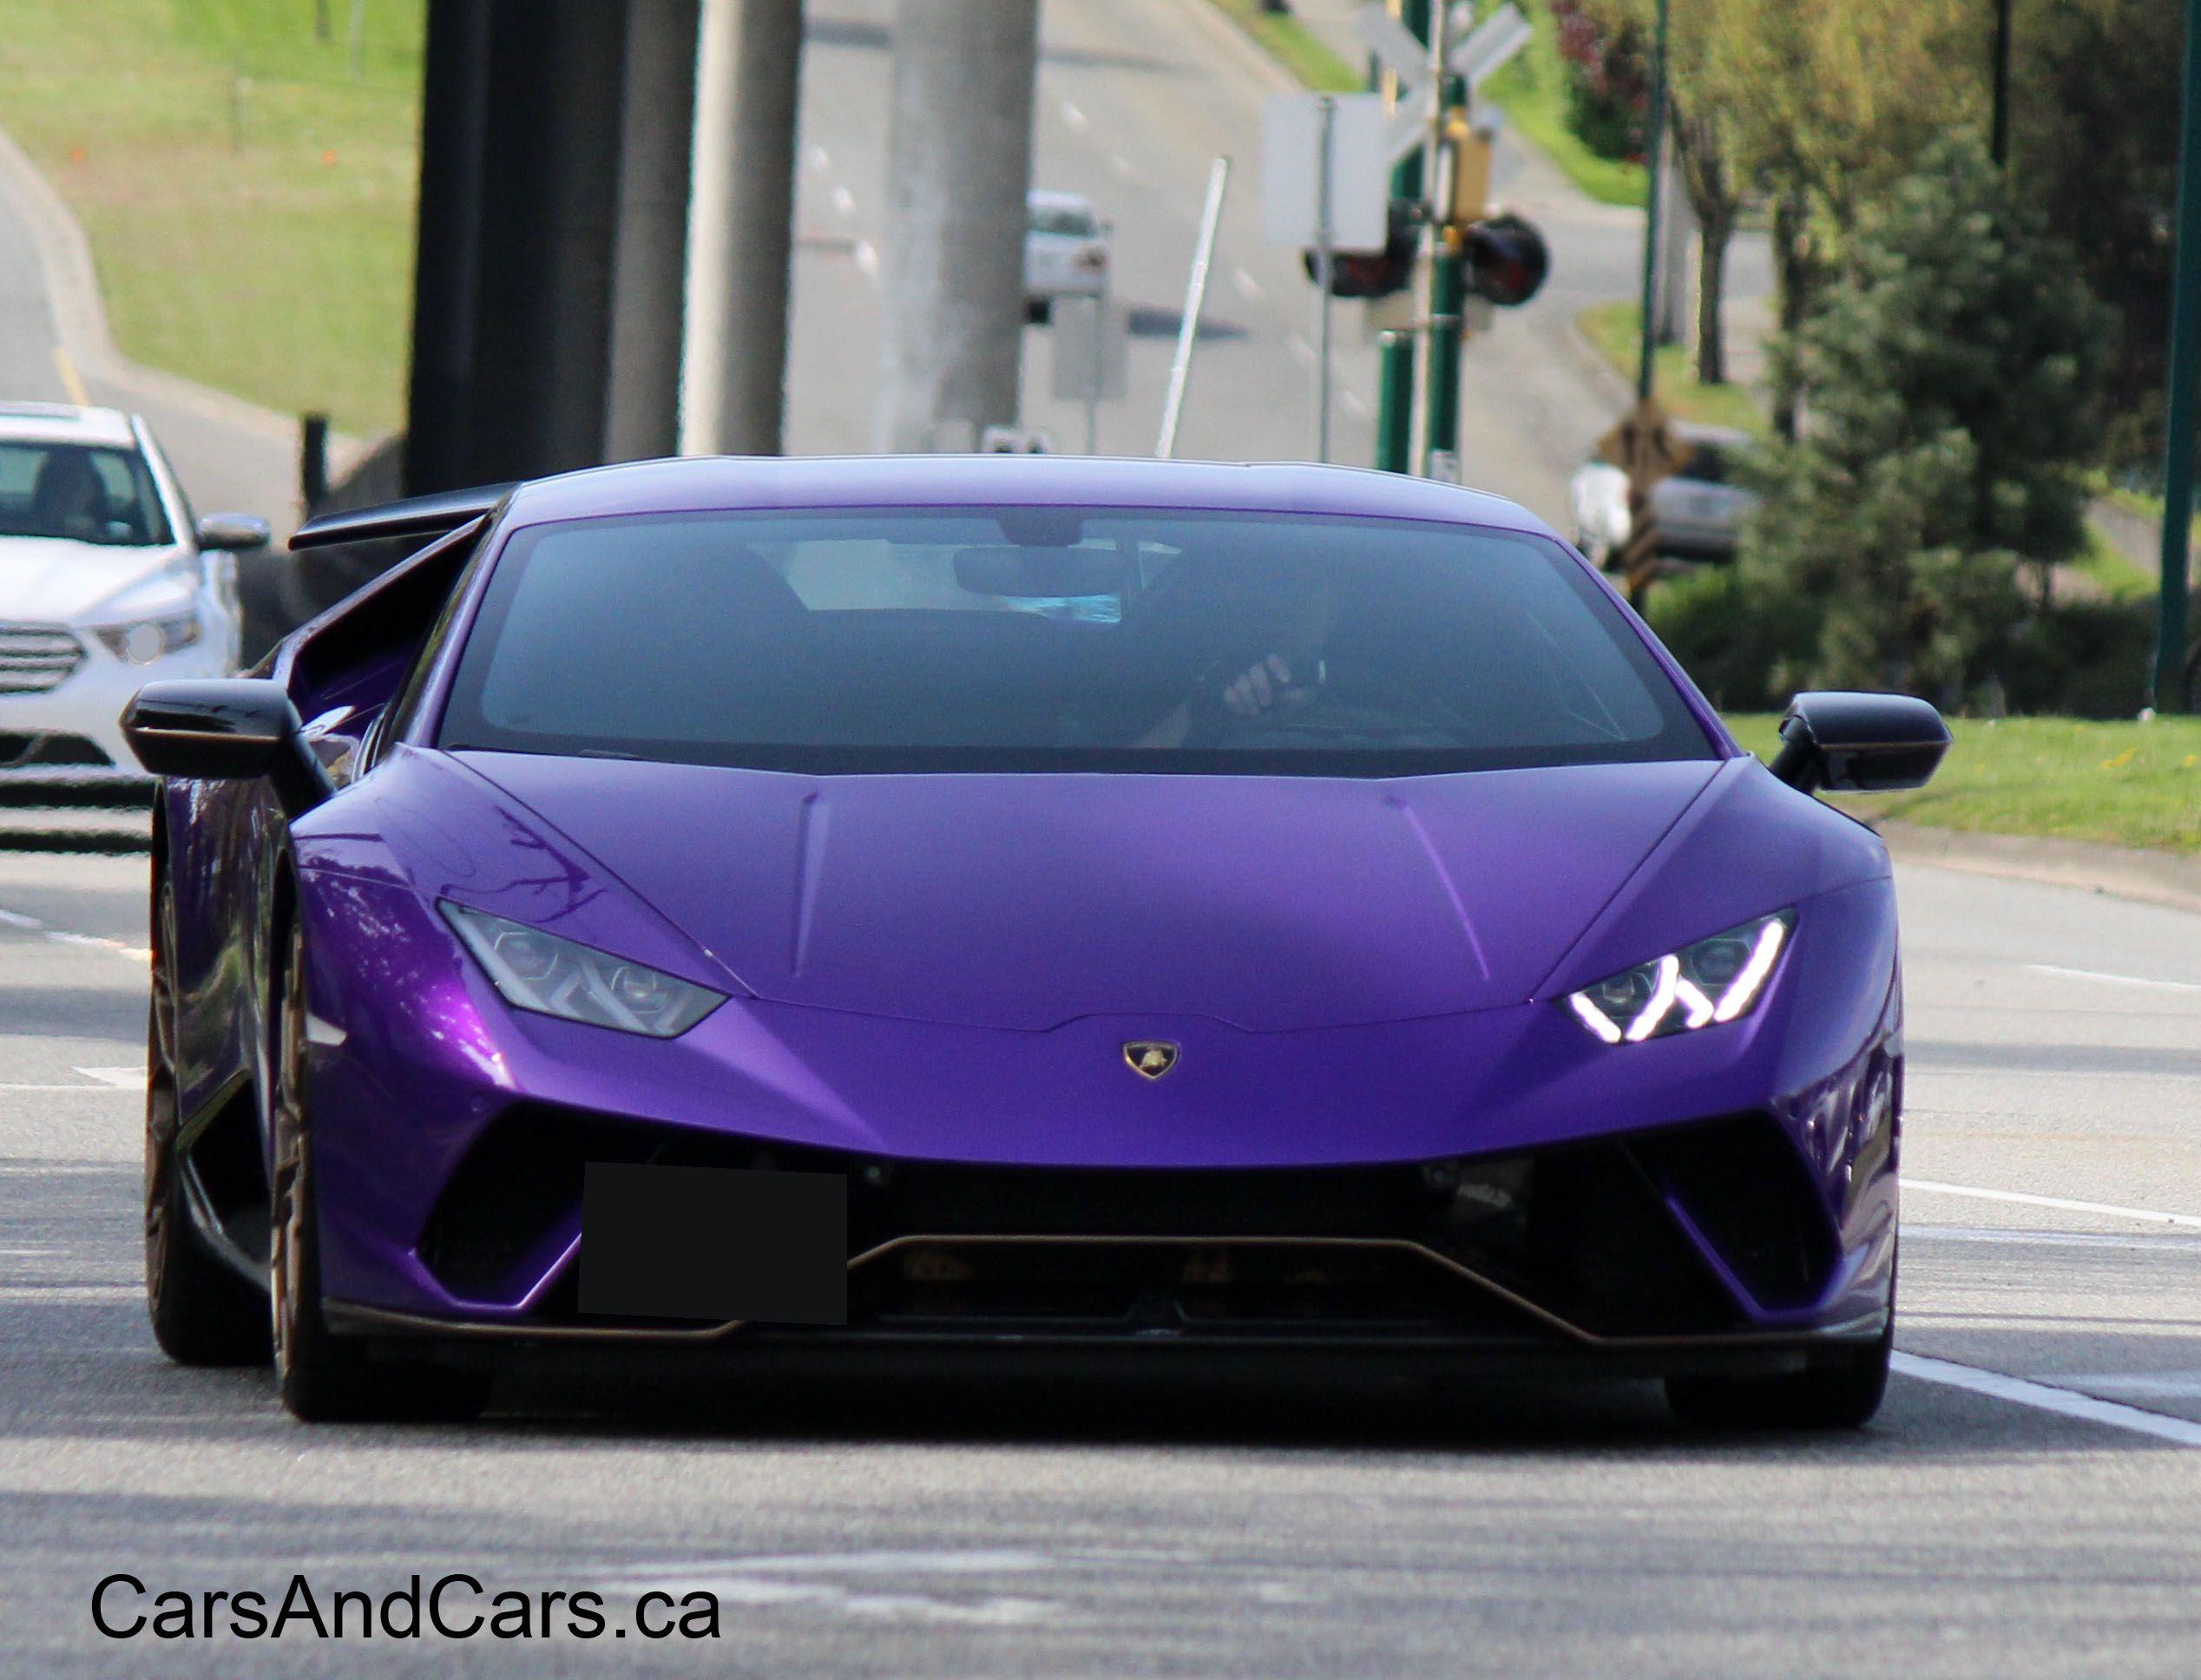 2020 Lamborghini Urus In Stuhr Germany For Sale 10839412 In 2020 Lamborghini Luxury Suv Suv